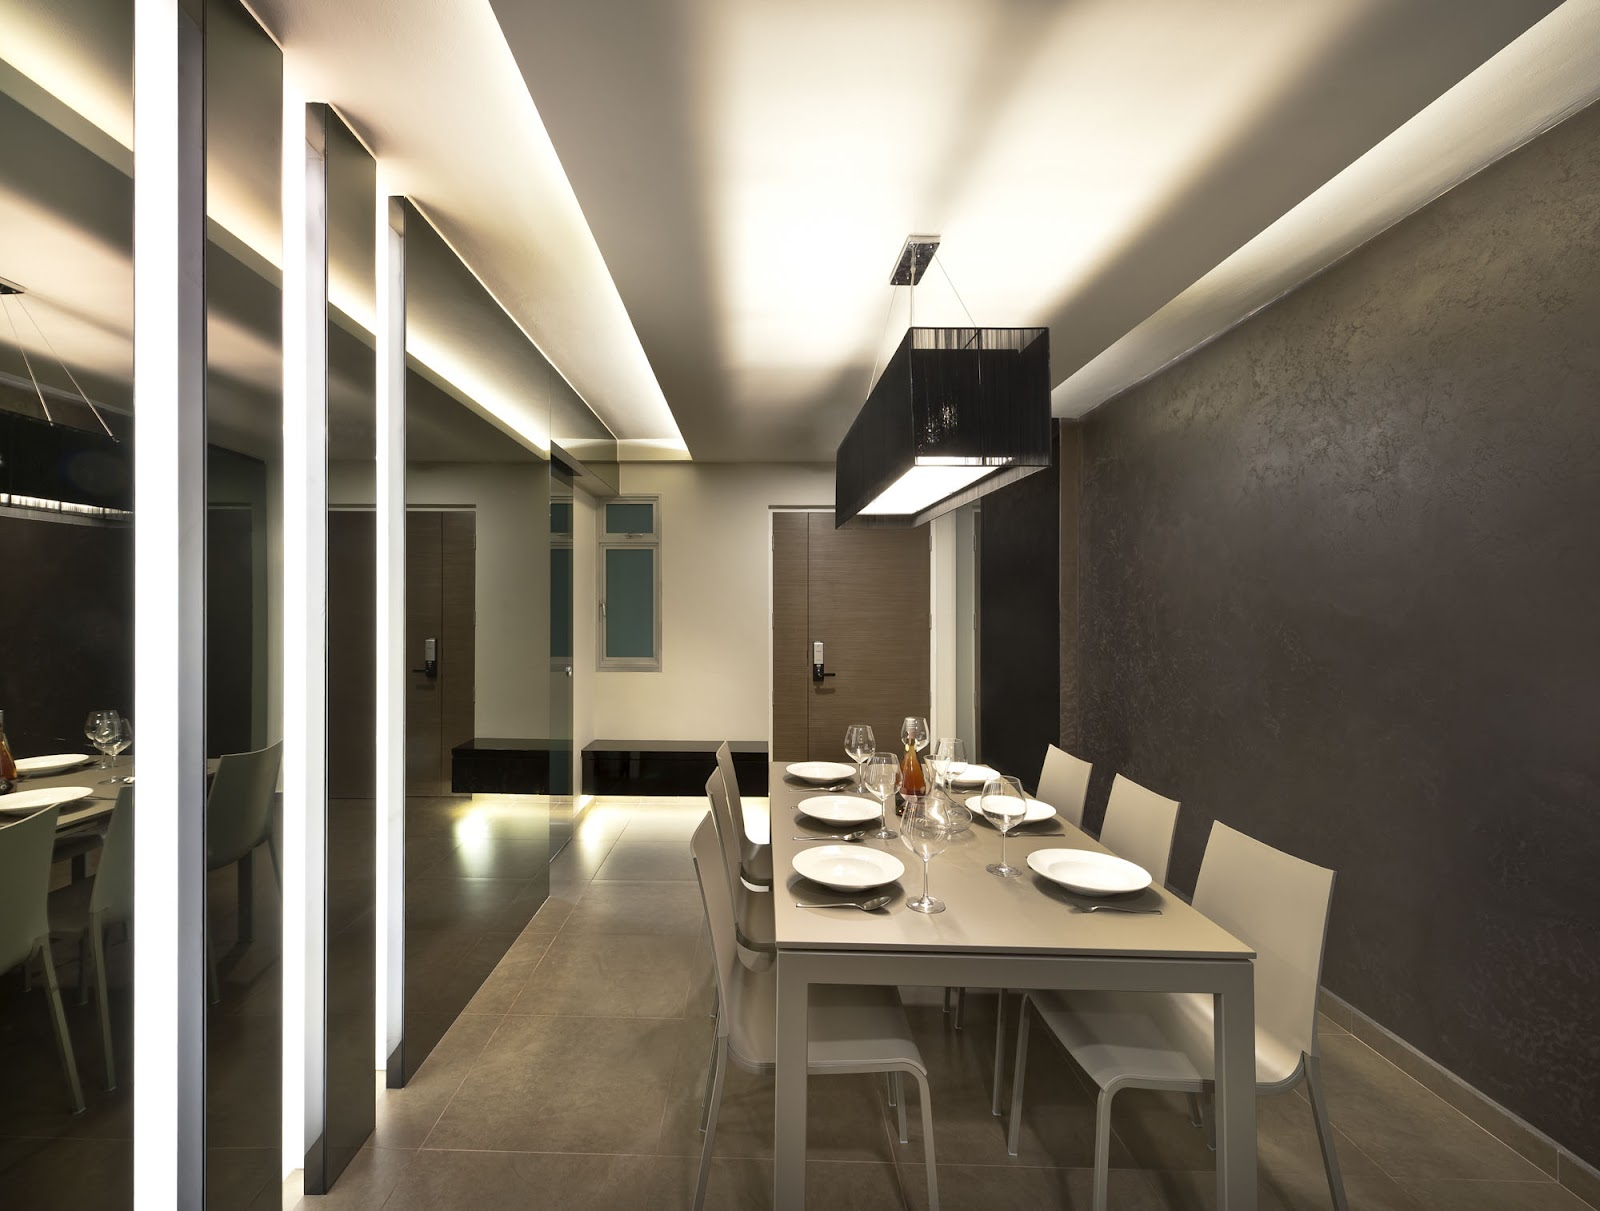 The Dining Room Tn